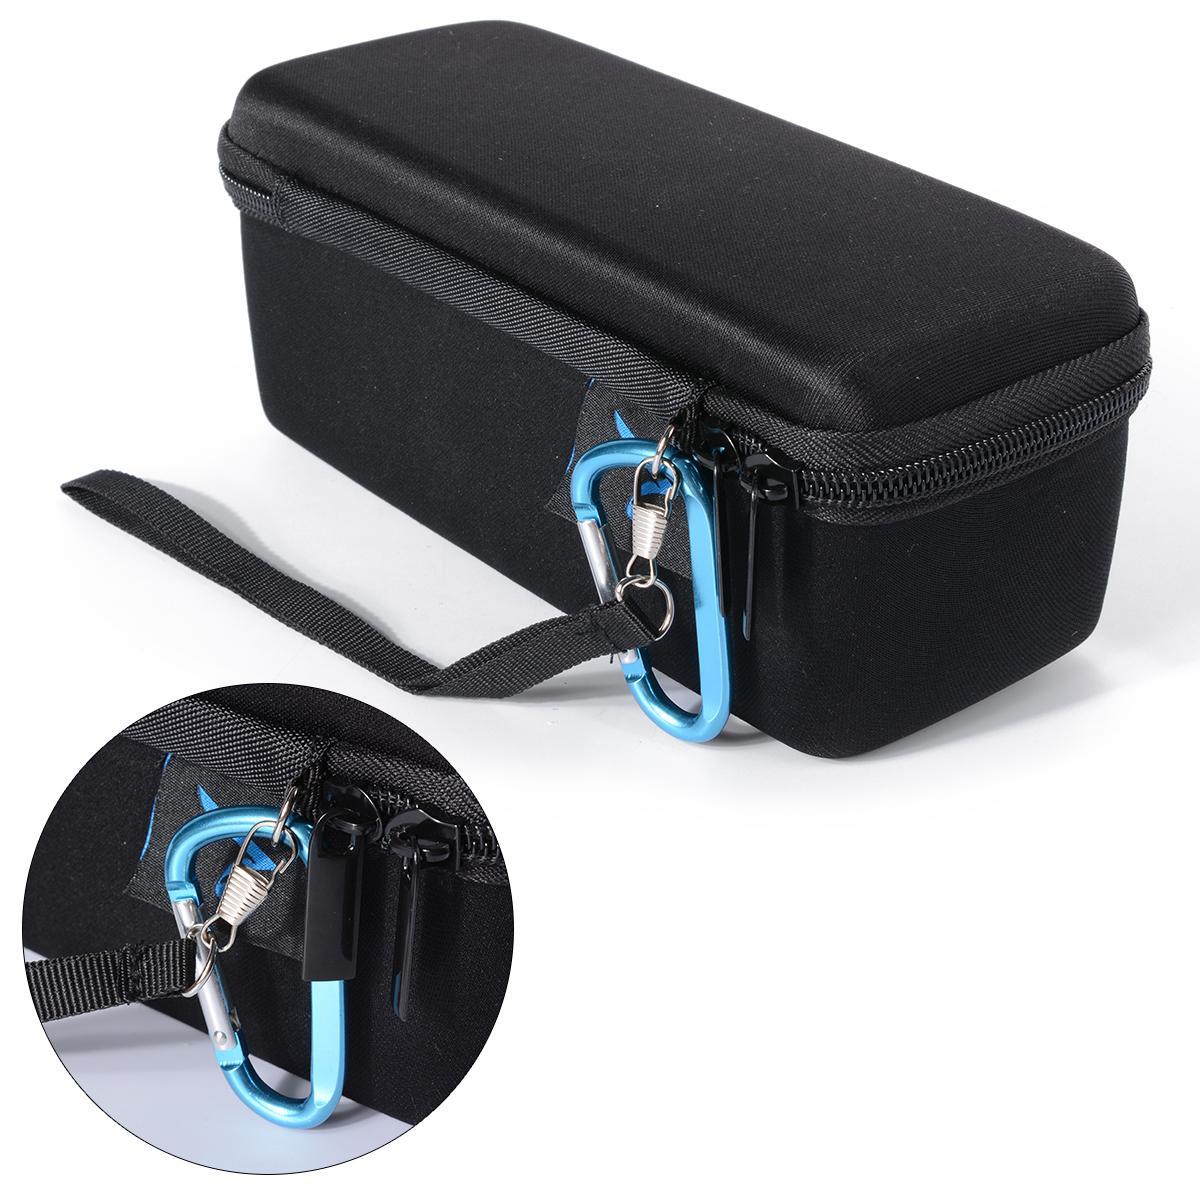 Gambar Produk Rinci XCSOURCE EVA Carry Travel Case Cover Bag for Bose Soundlink Mini Bluetooth Speaker PC661 Terkini